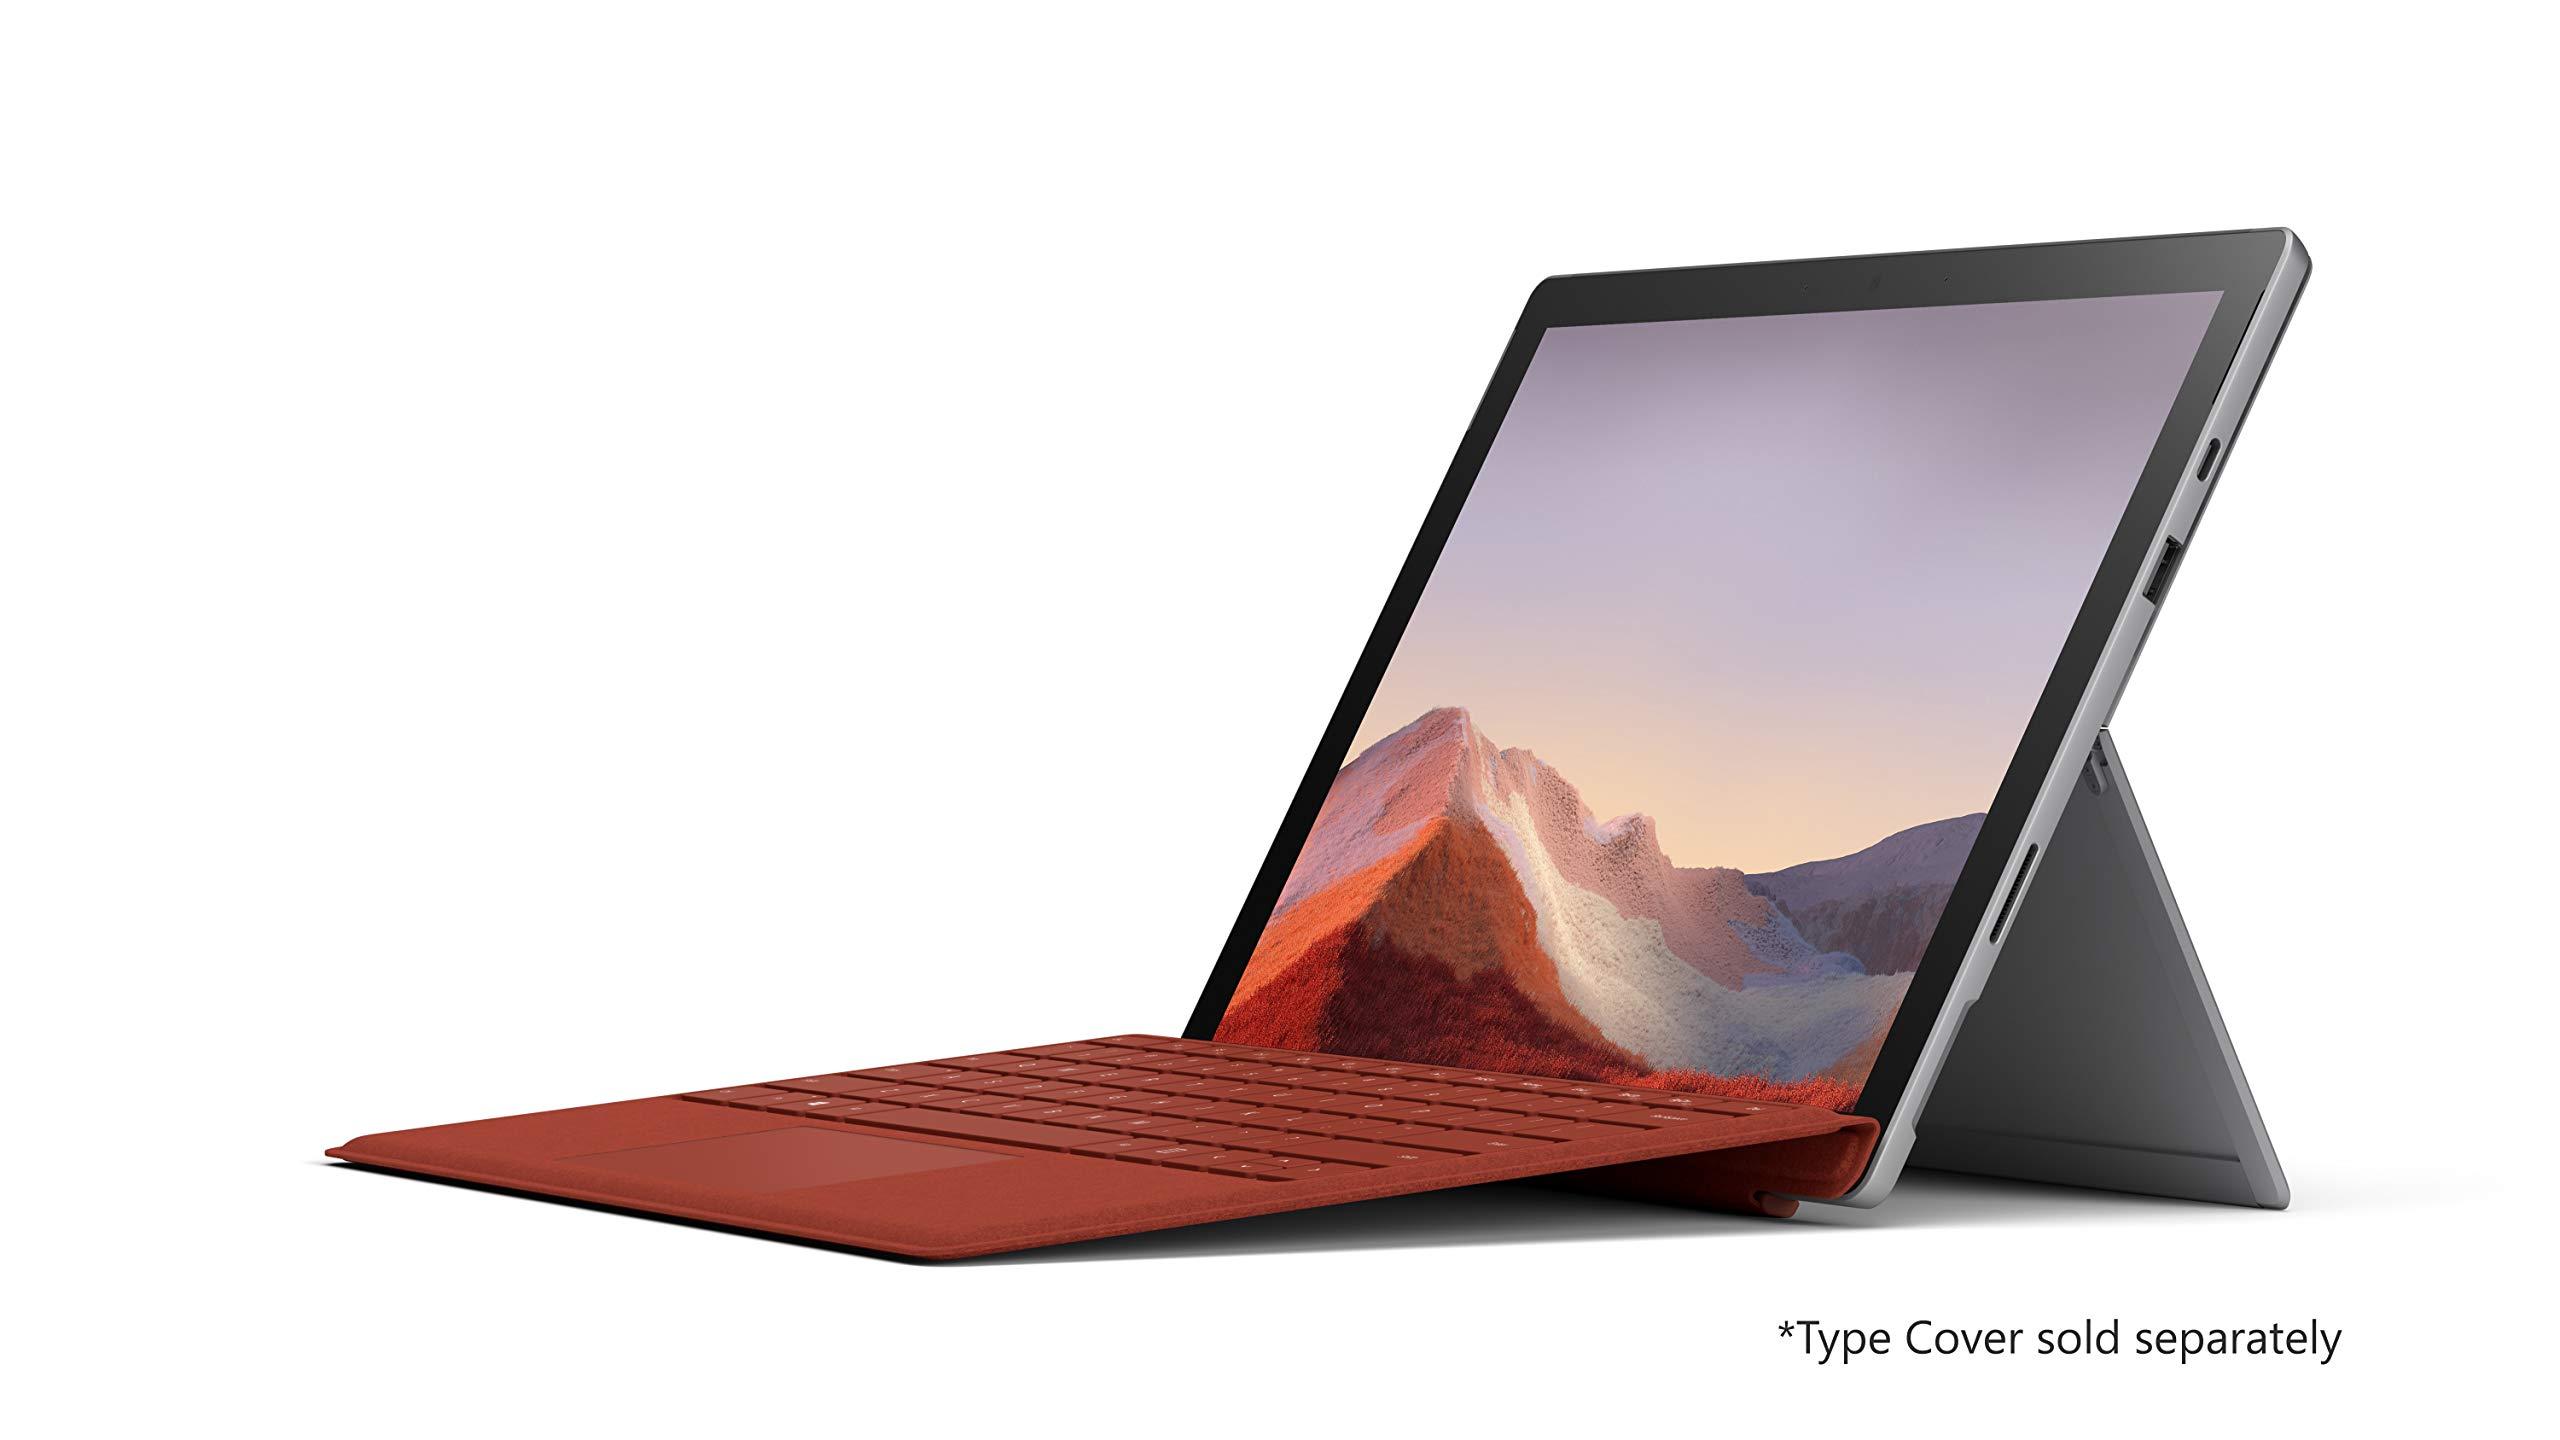 new-microsoft-surface-pro-7-123-touch-screen-10th-gen-intel-core-i5-8gb-memory-128gb-ssd-latest-model-platinum